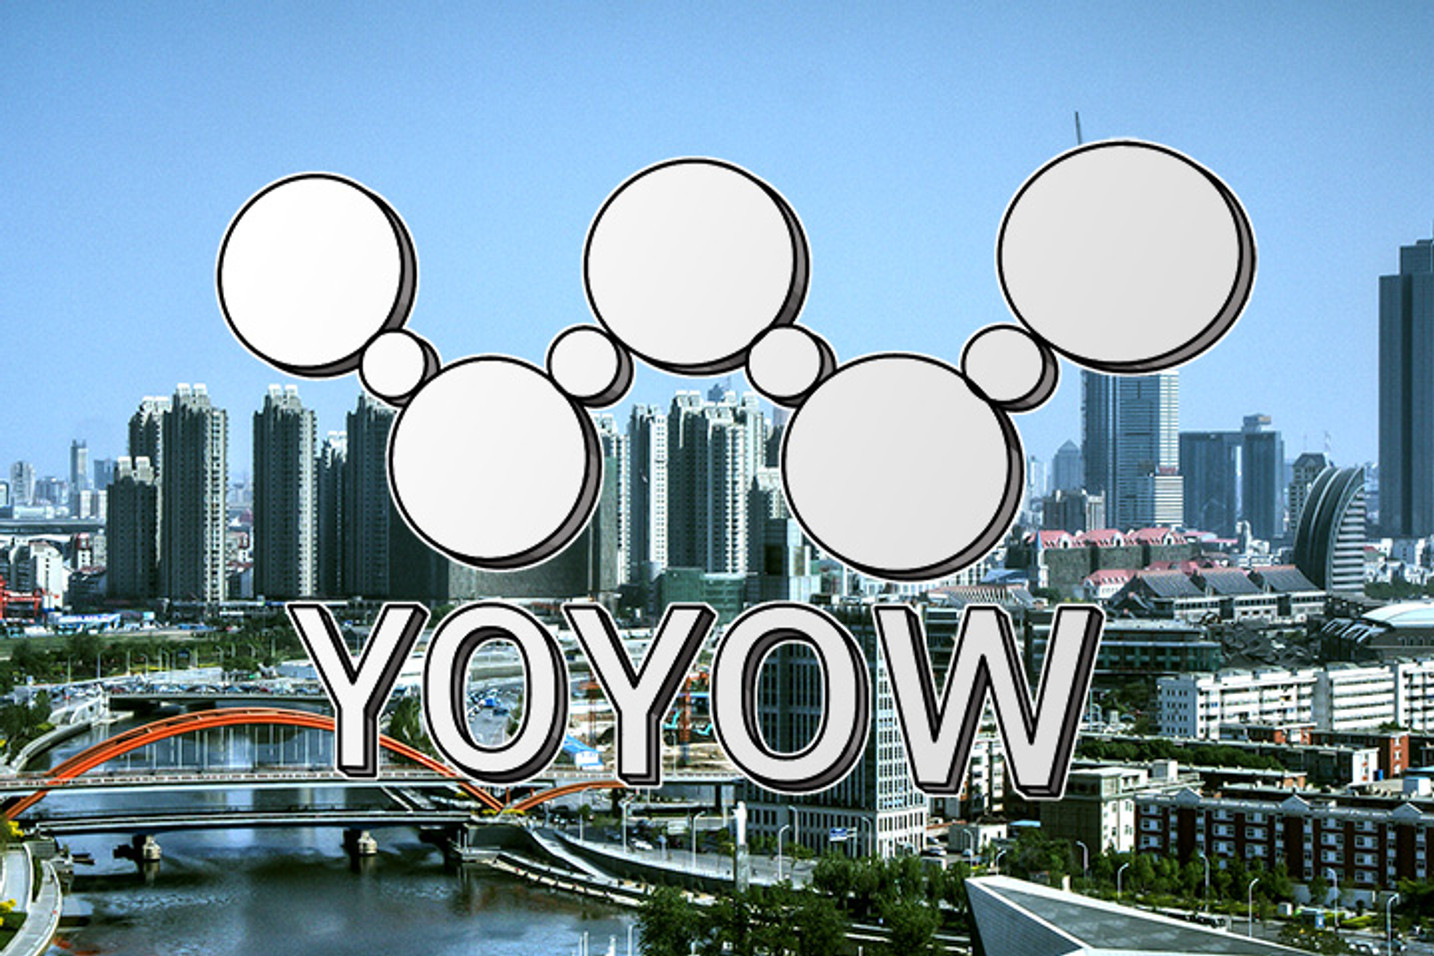 Yoyow.org - a Better Blockchain-Based Social Media Platform